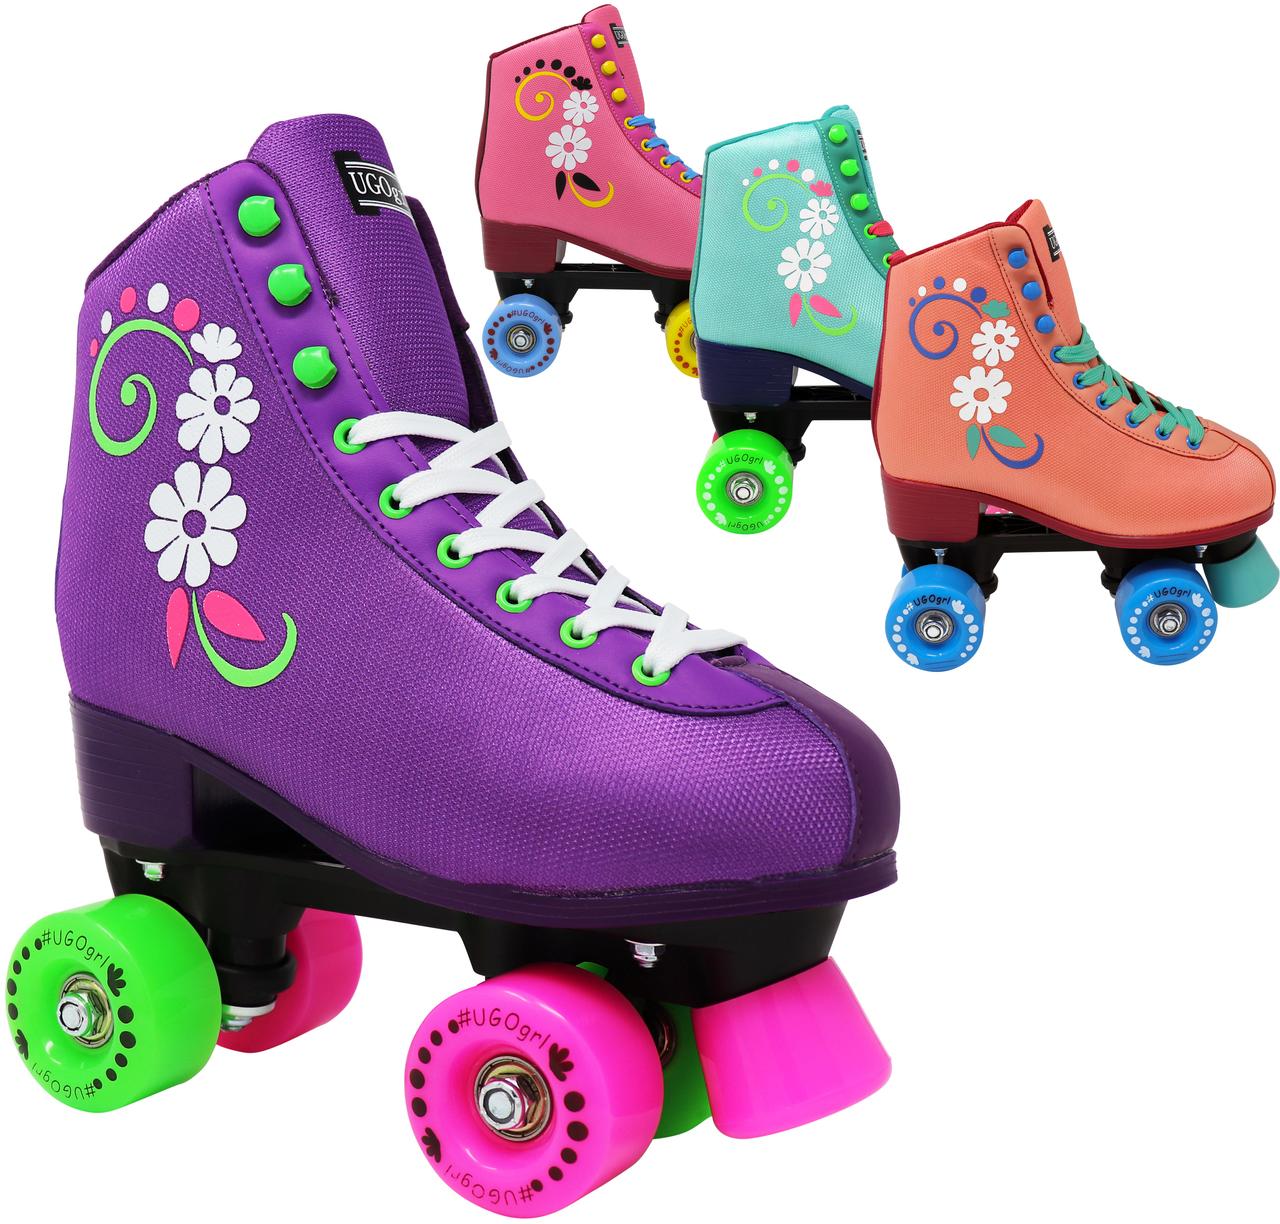 INSTOCK! Last Ones! UGOGRL Youth & Adult Beginner Roller Skate - Indoor AND Outdoor!